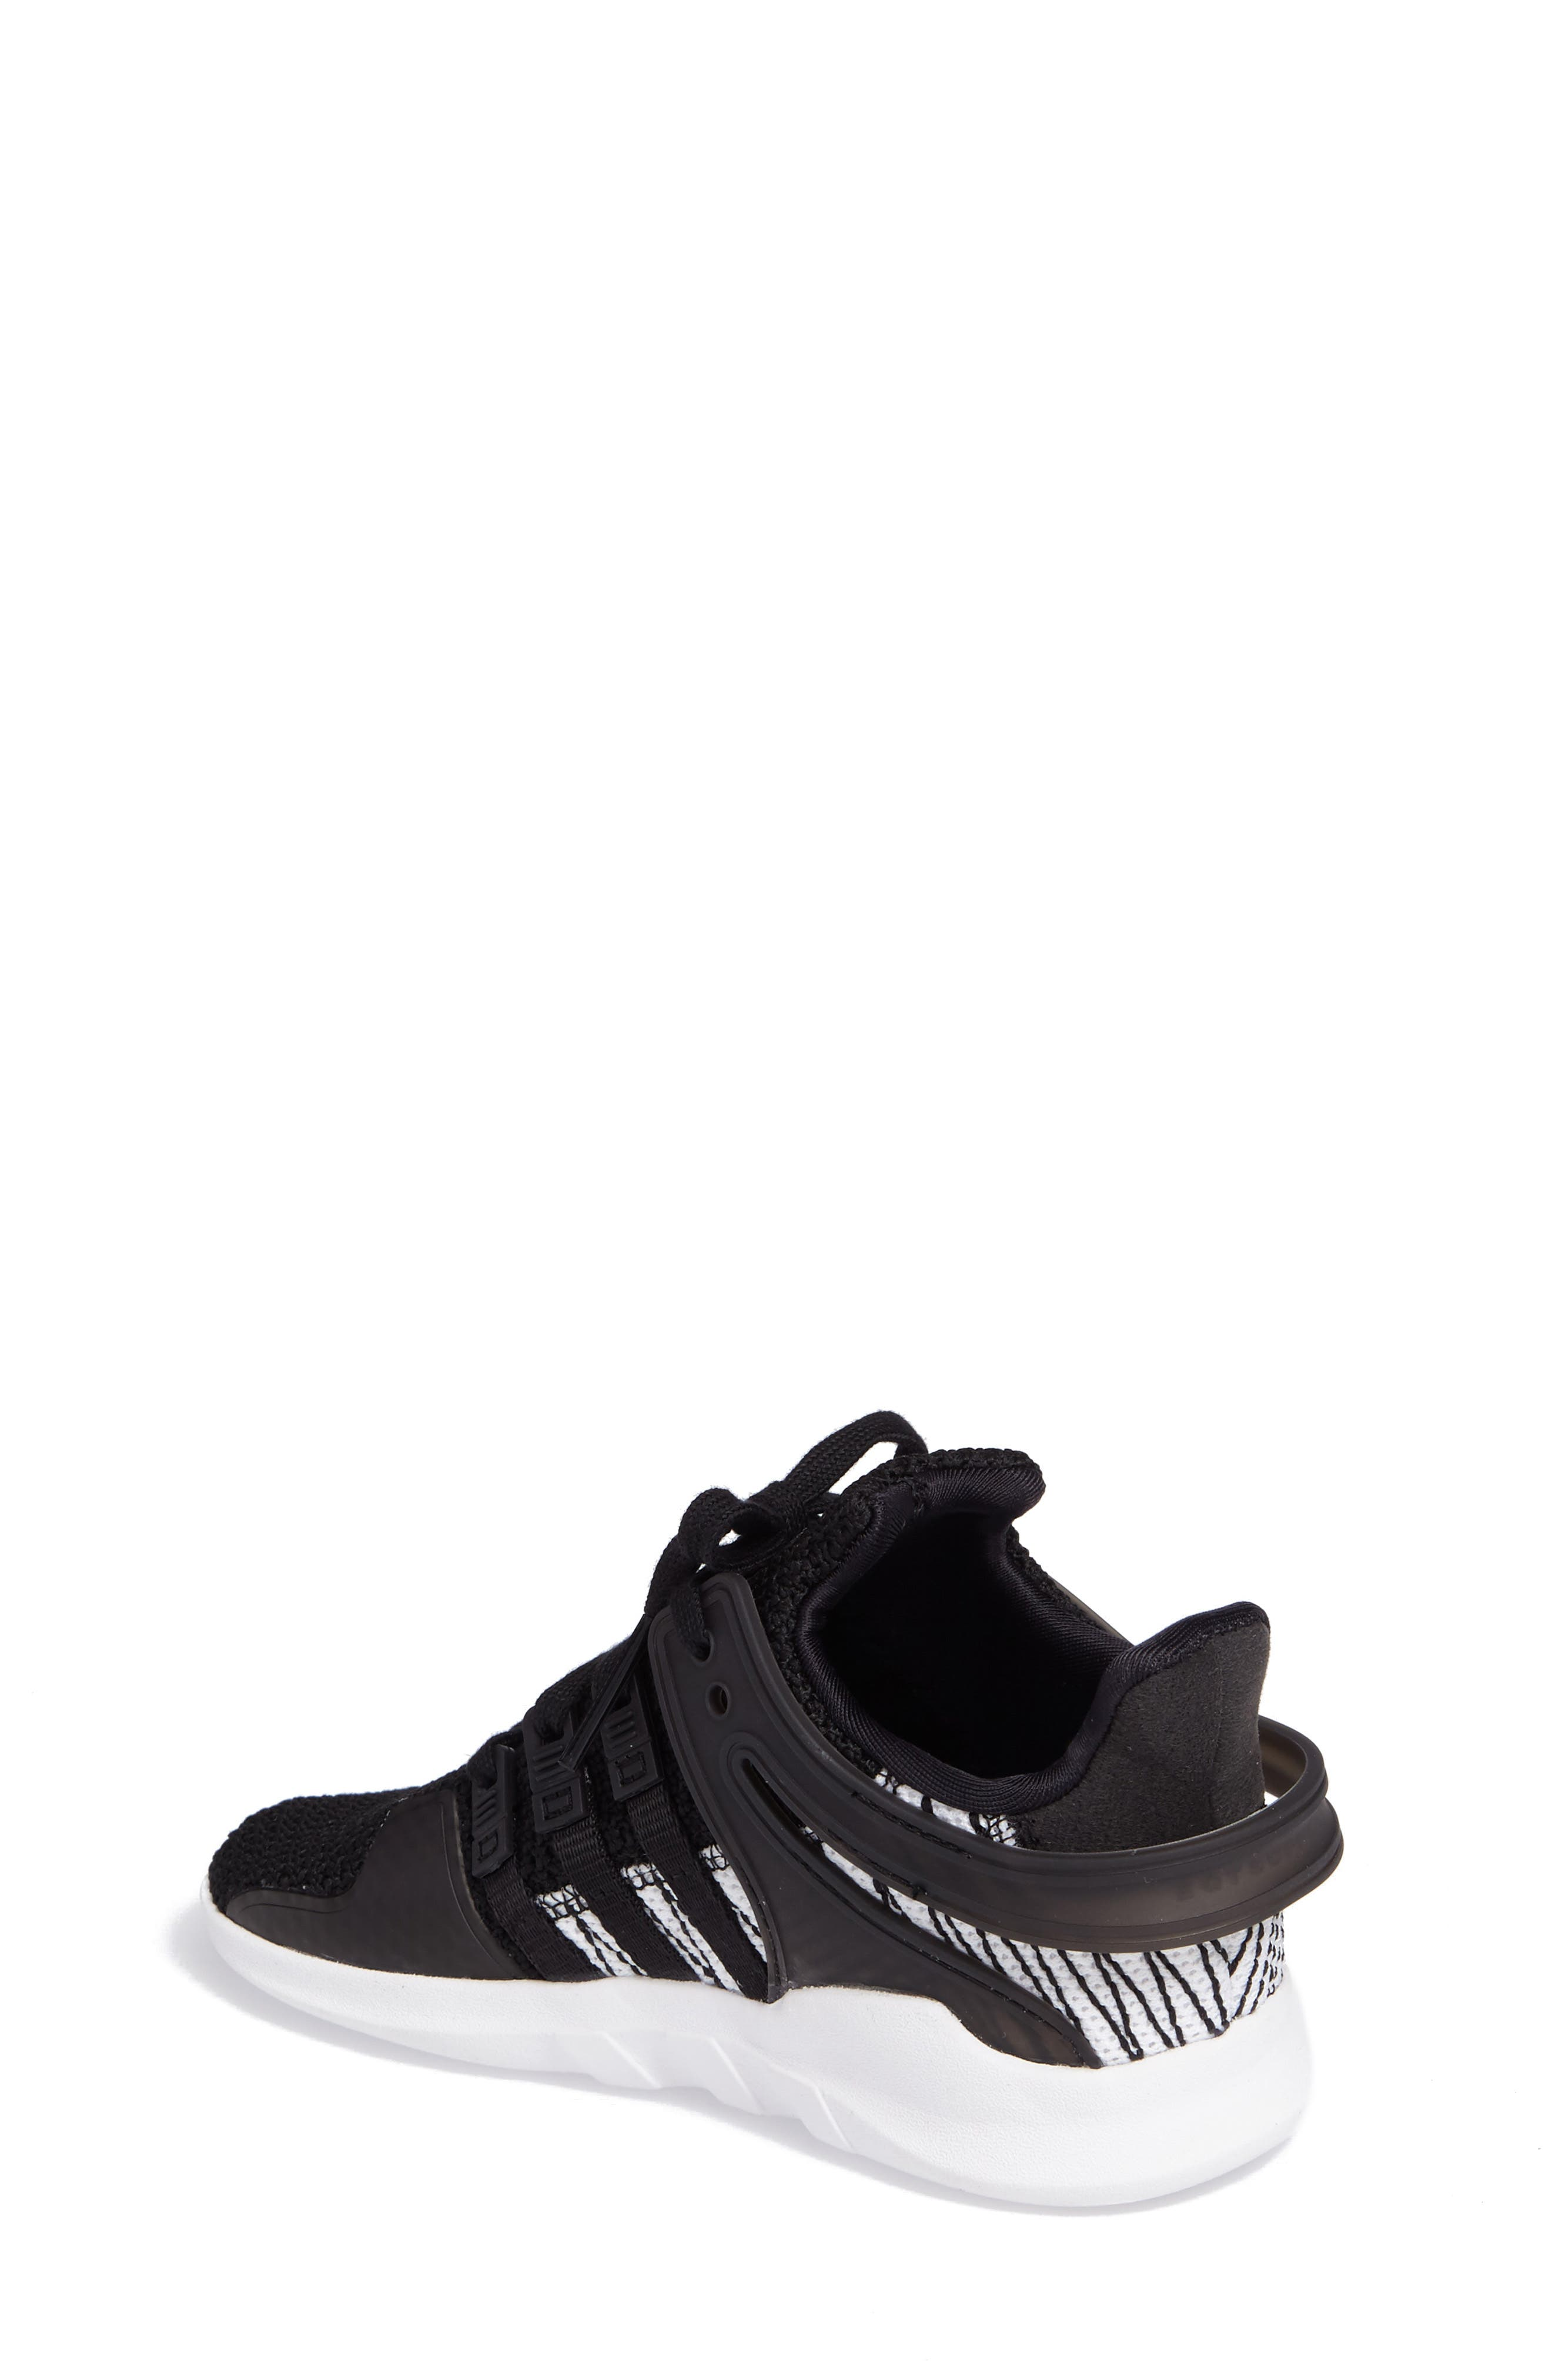 EQT Support ADV I Sneaker,                             Alternate thumbnail 2, color,                             001